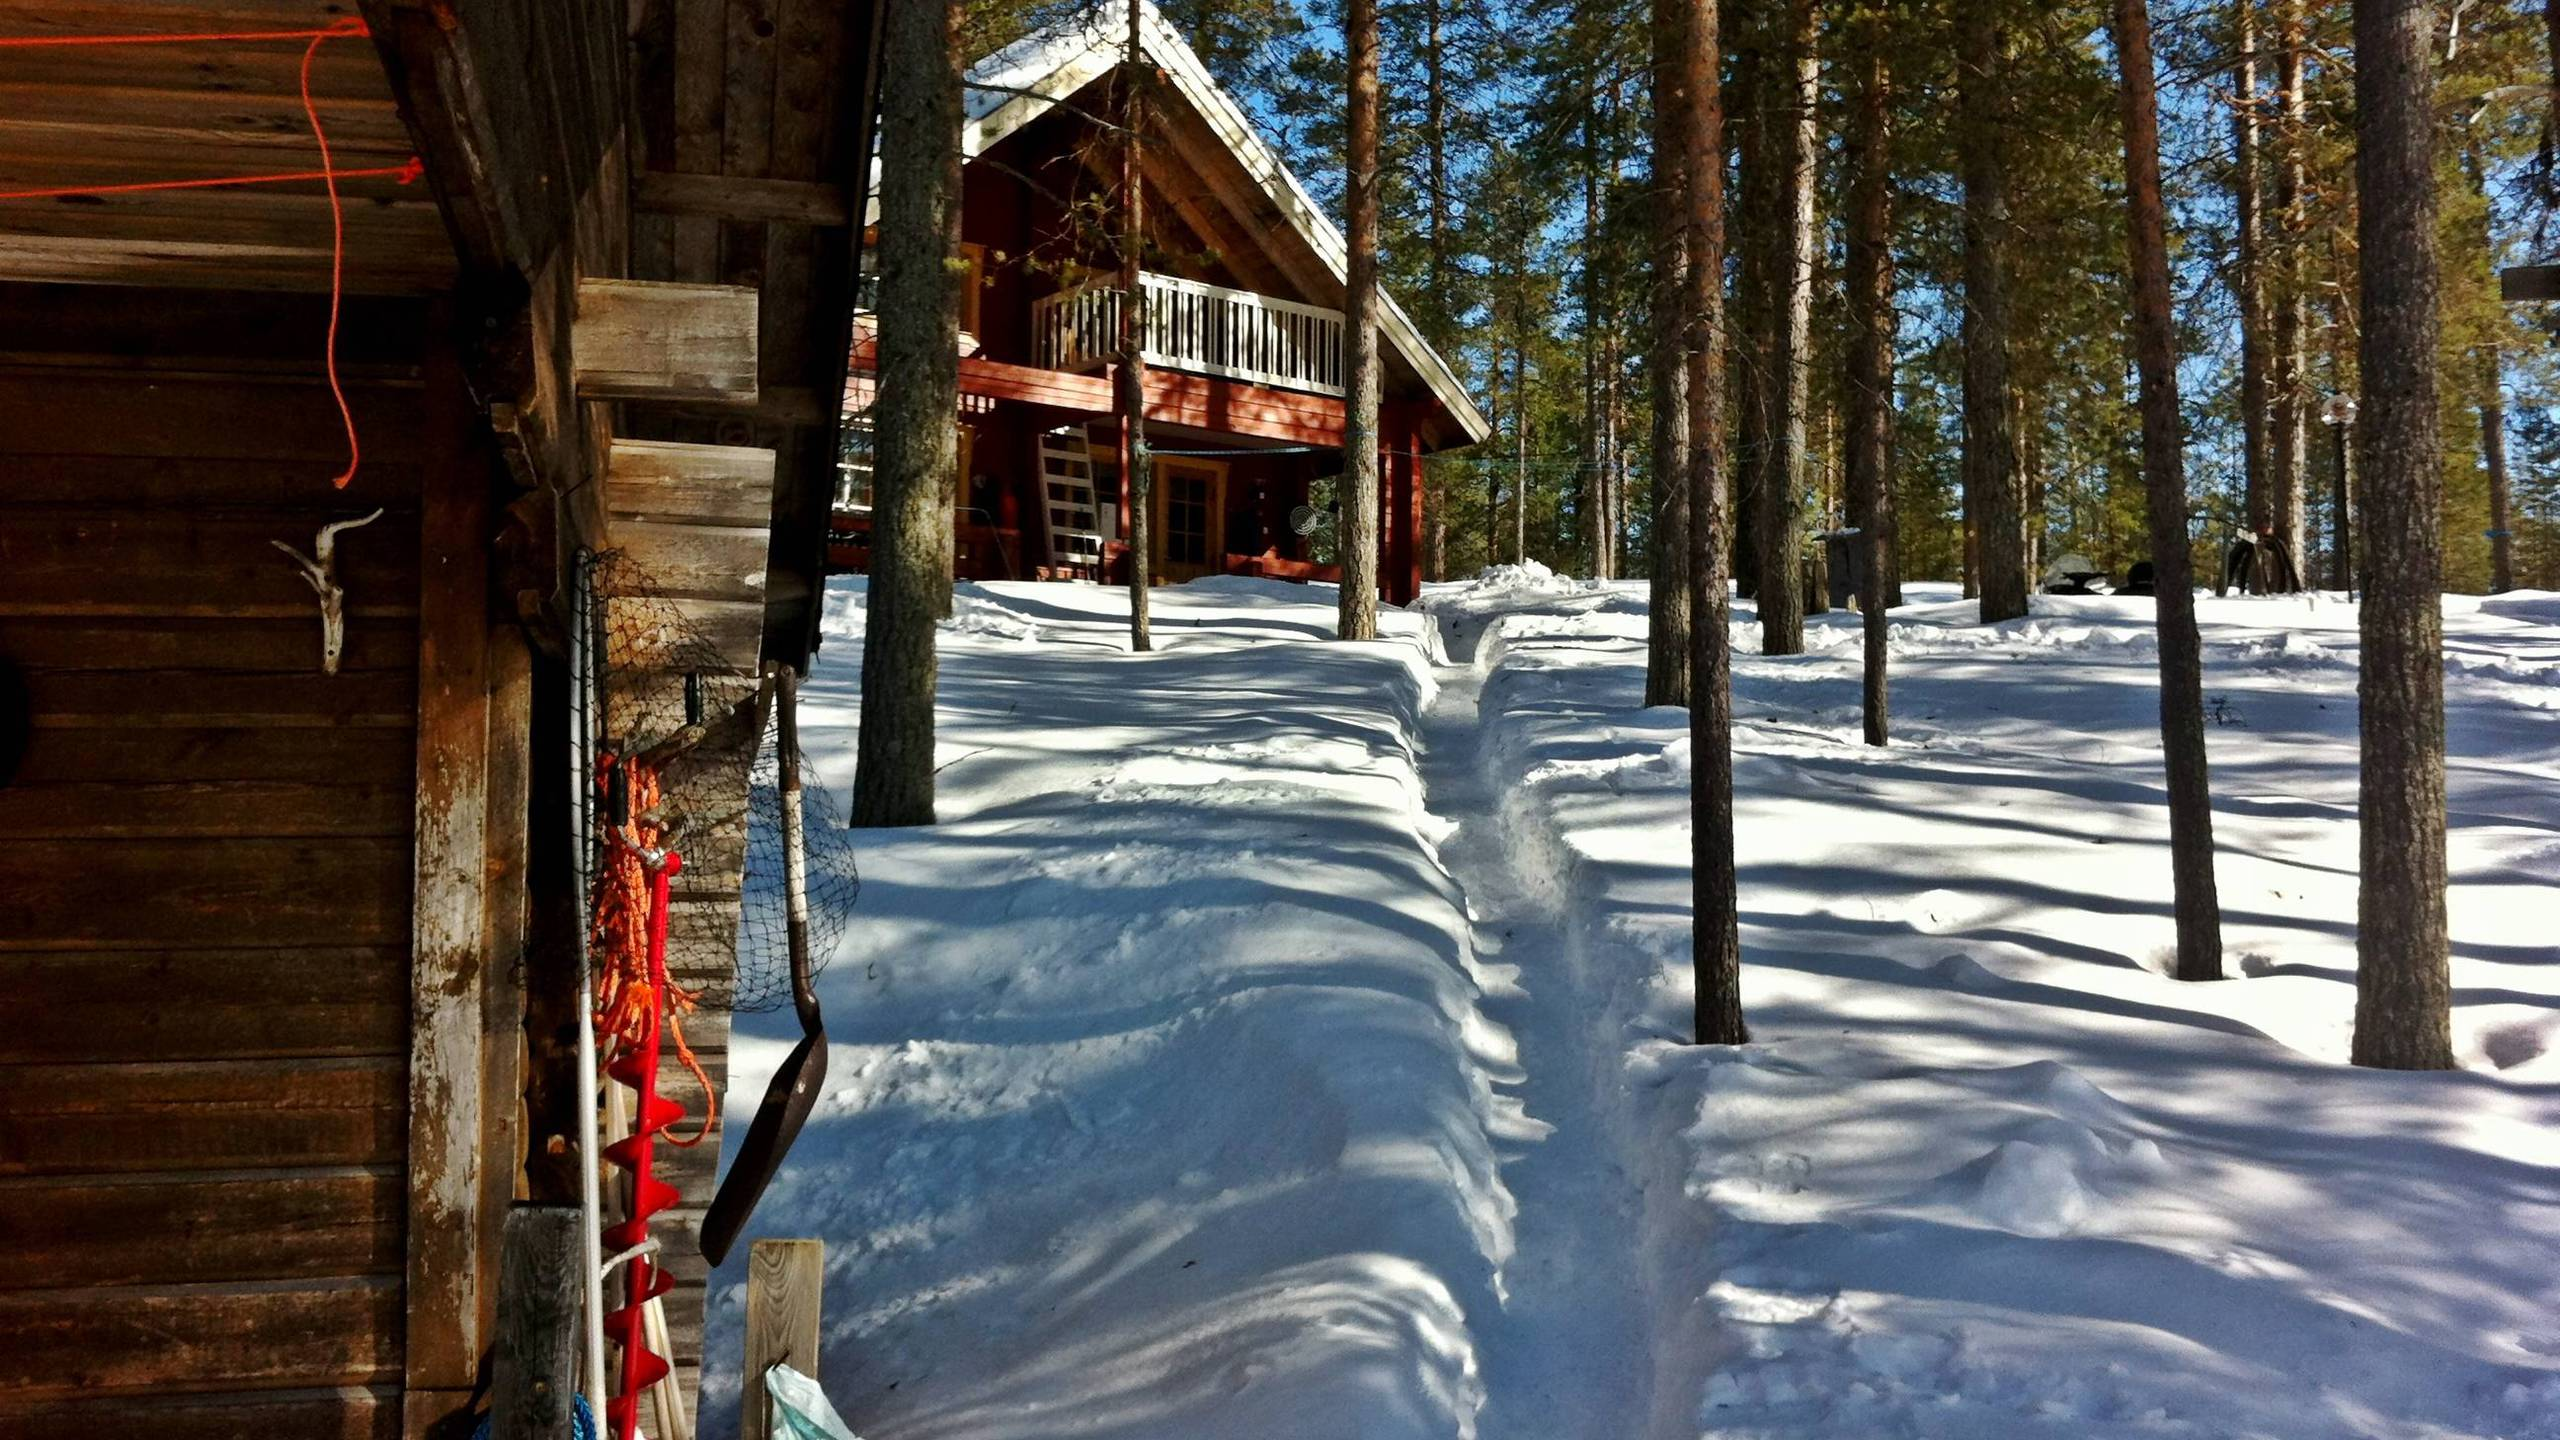 BOTPOST [BOT] Frozen Finnish Cabin iimgurcom 2560x1440